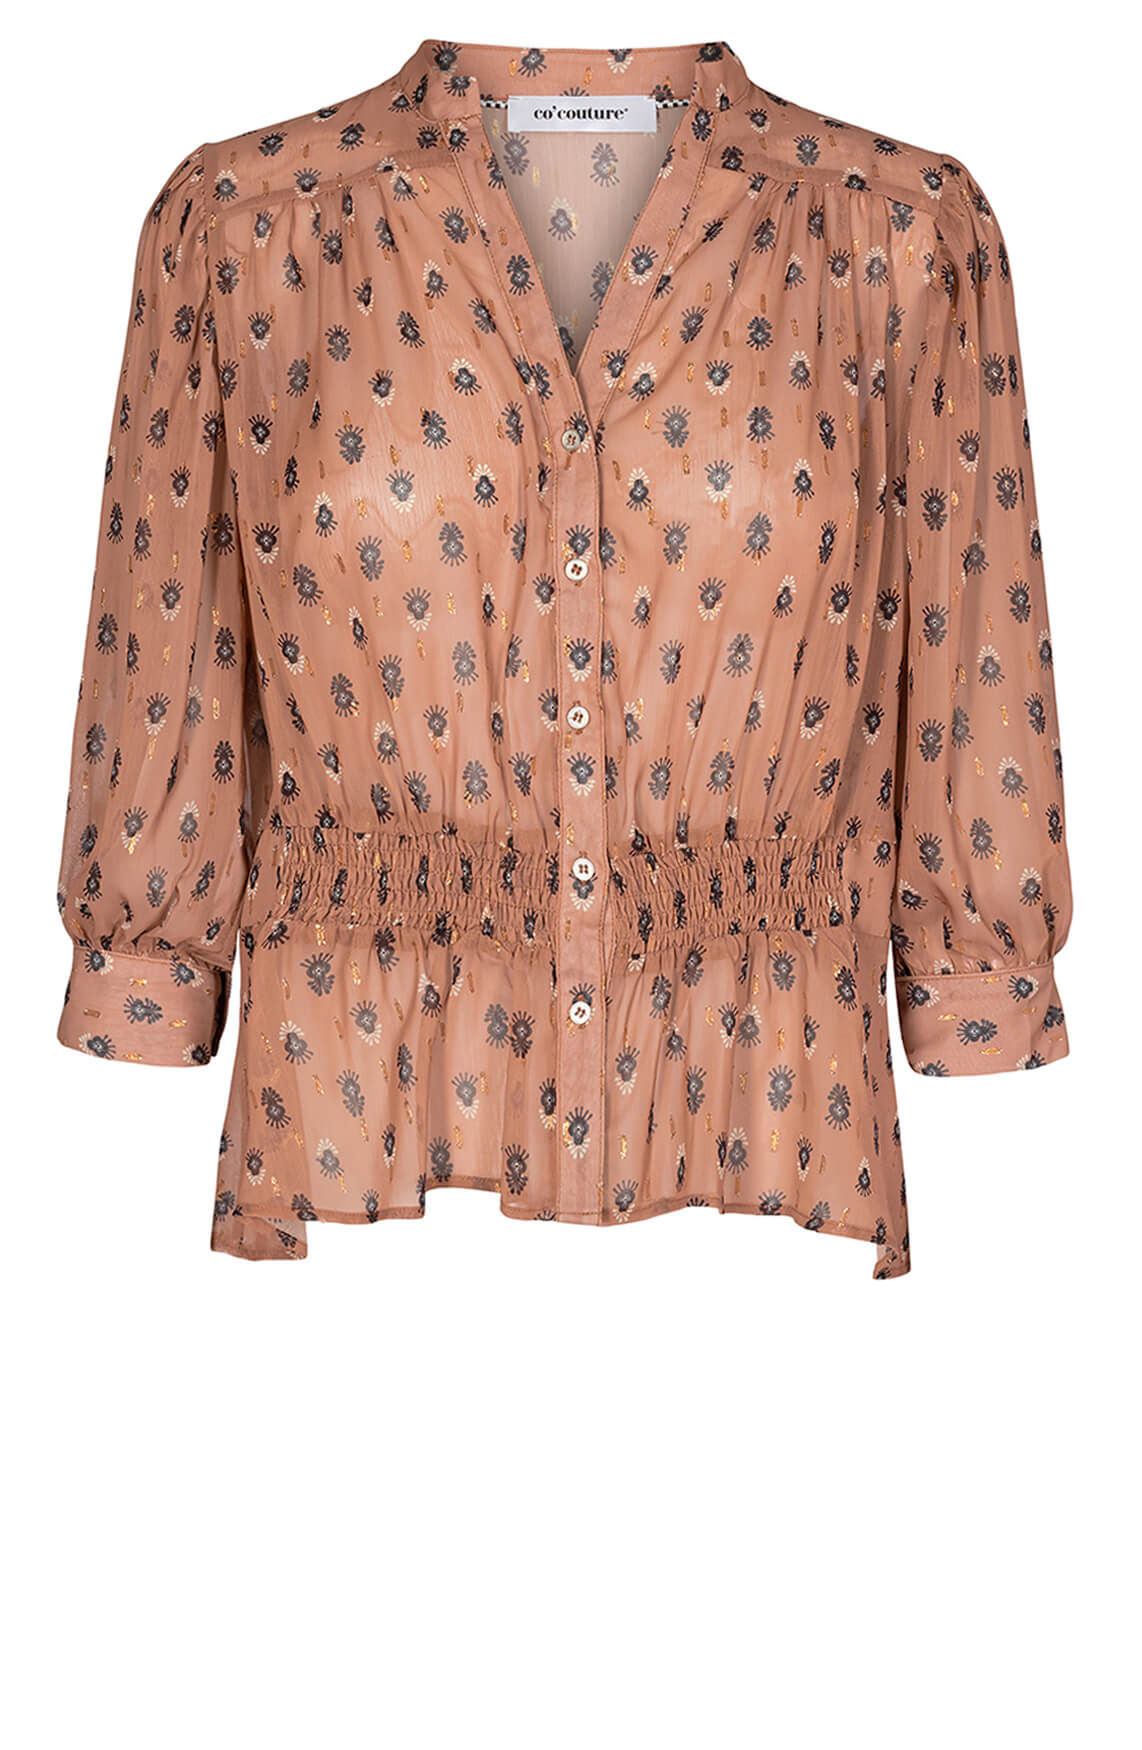 Co Couture Dames Moni blouse Bruin